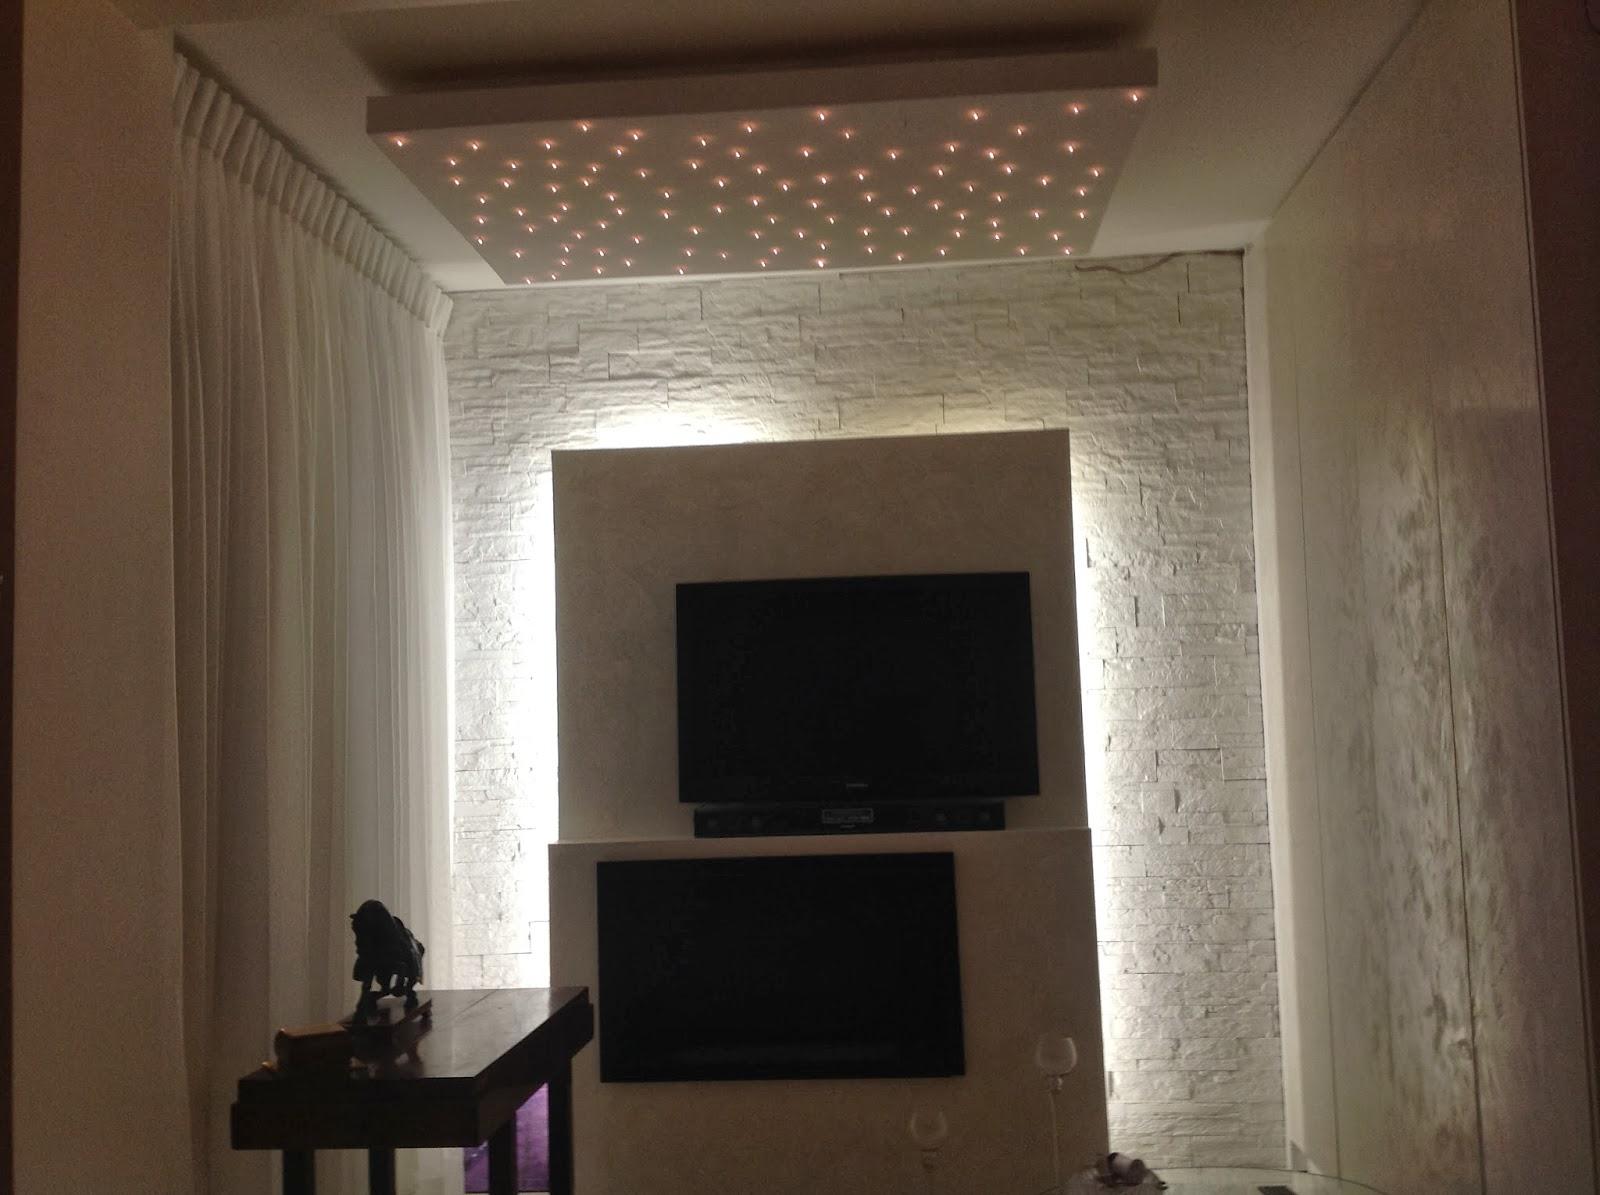 midlightsun lighting ciel toil plafond lumineux. Black Bedroom Furniture Sets. Home Design Ideas